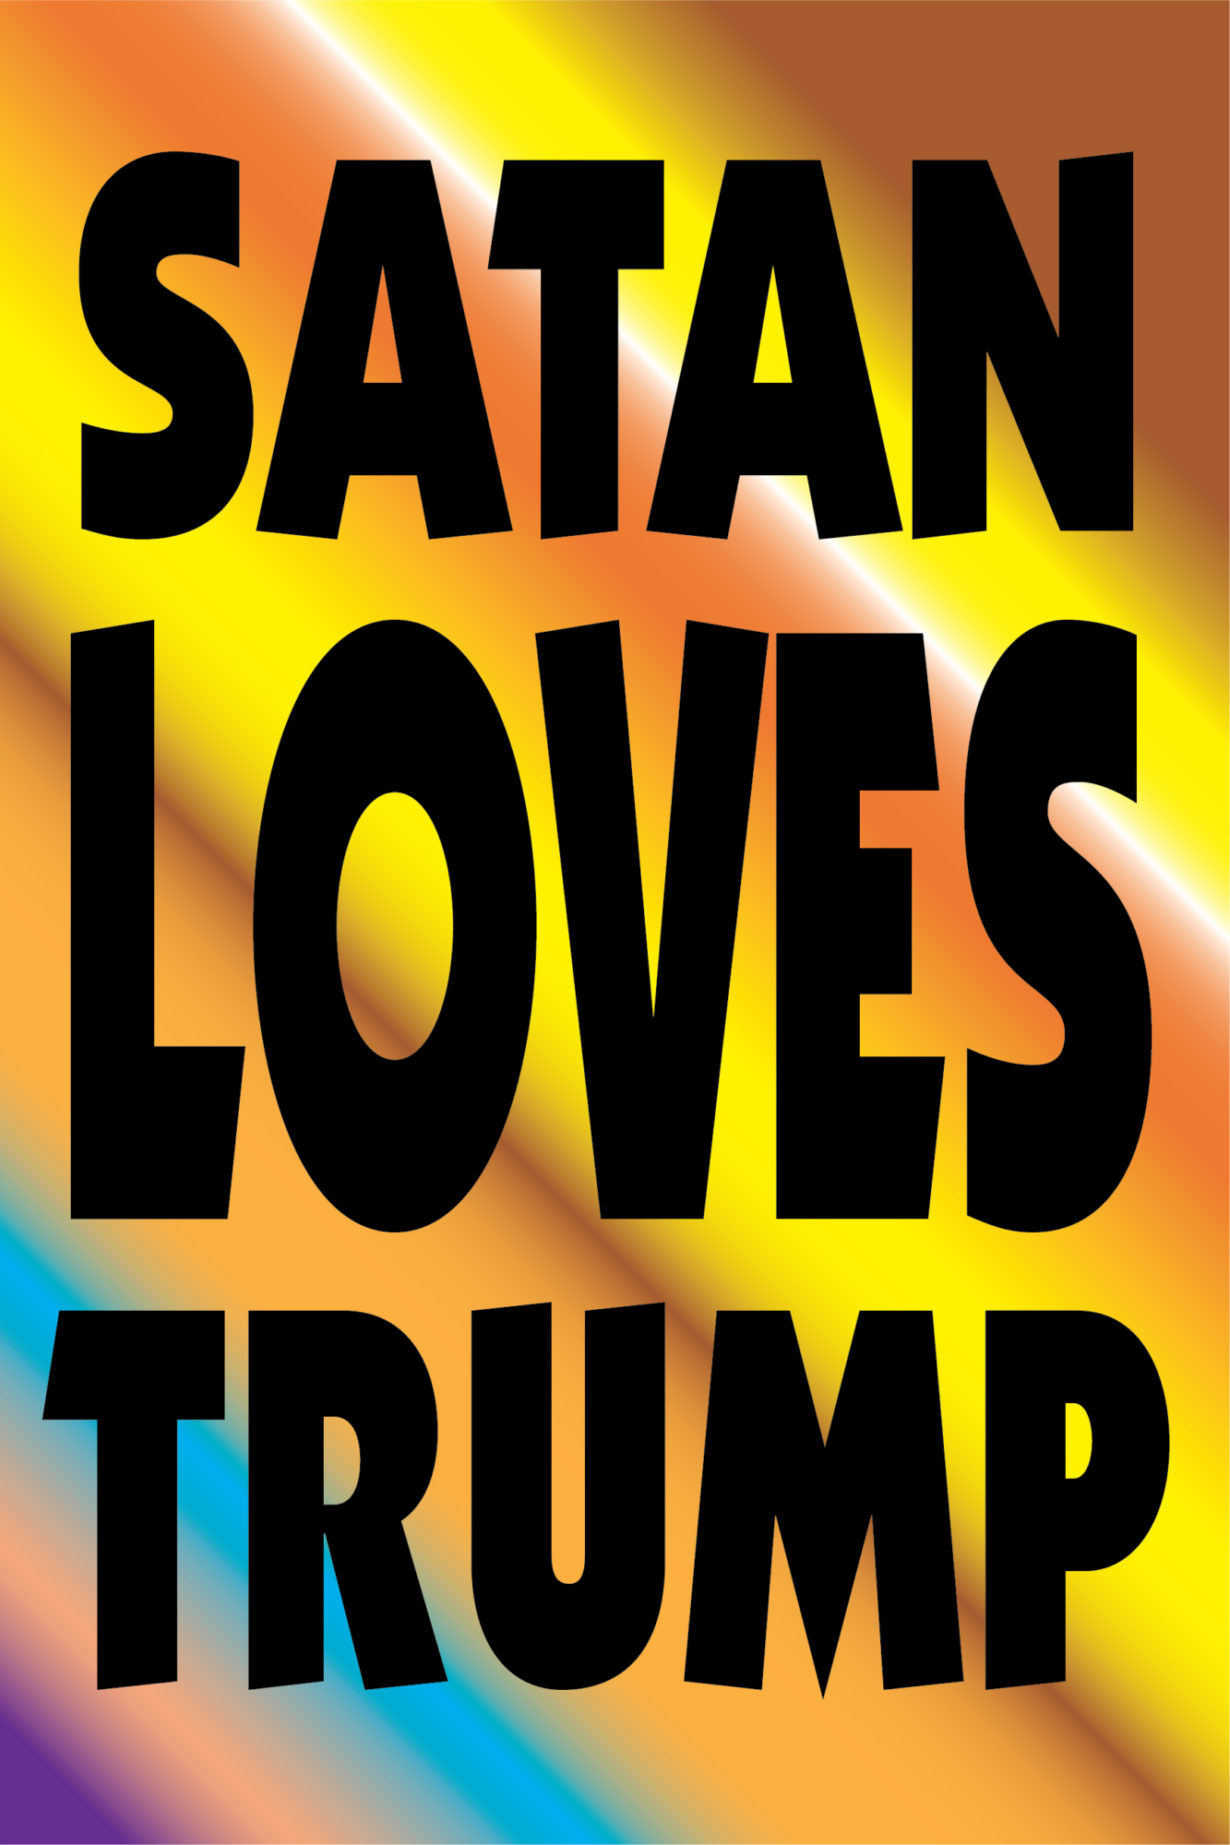 NP_76_100_2017_Satan-Loves-Trump.jpg